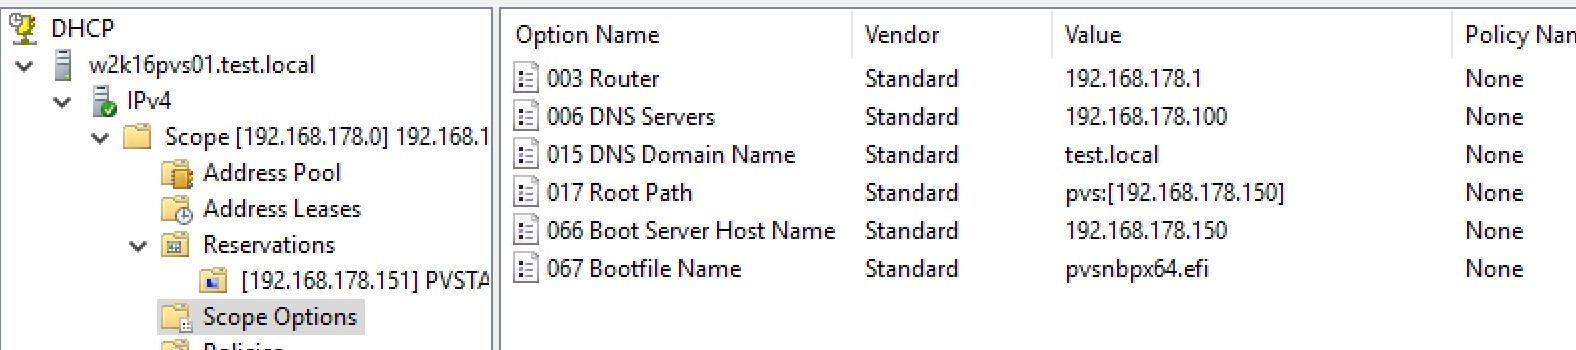 Citrix Provisioning Services Zielsysteme in Hyper-V VMs ohne